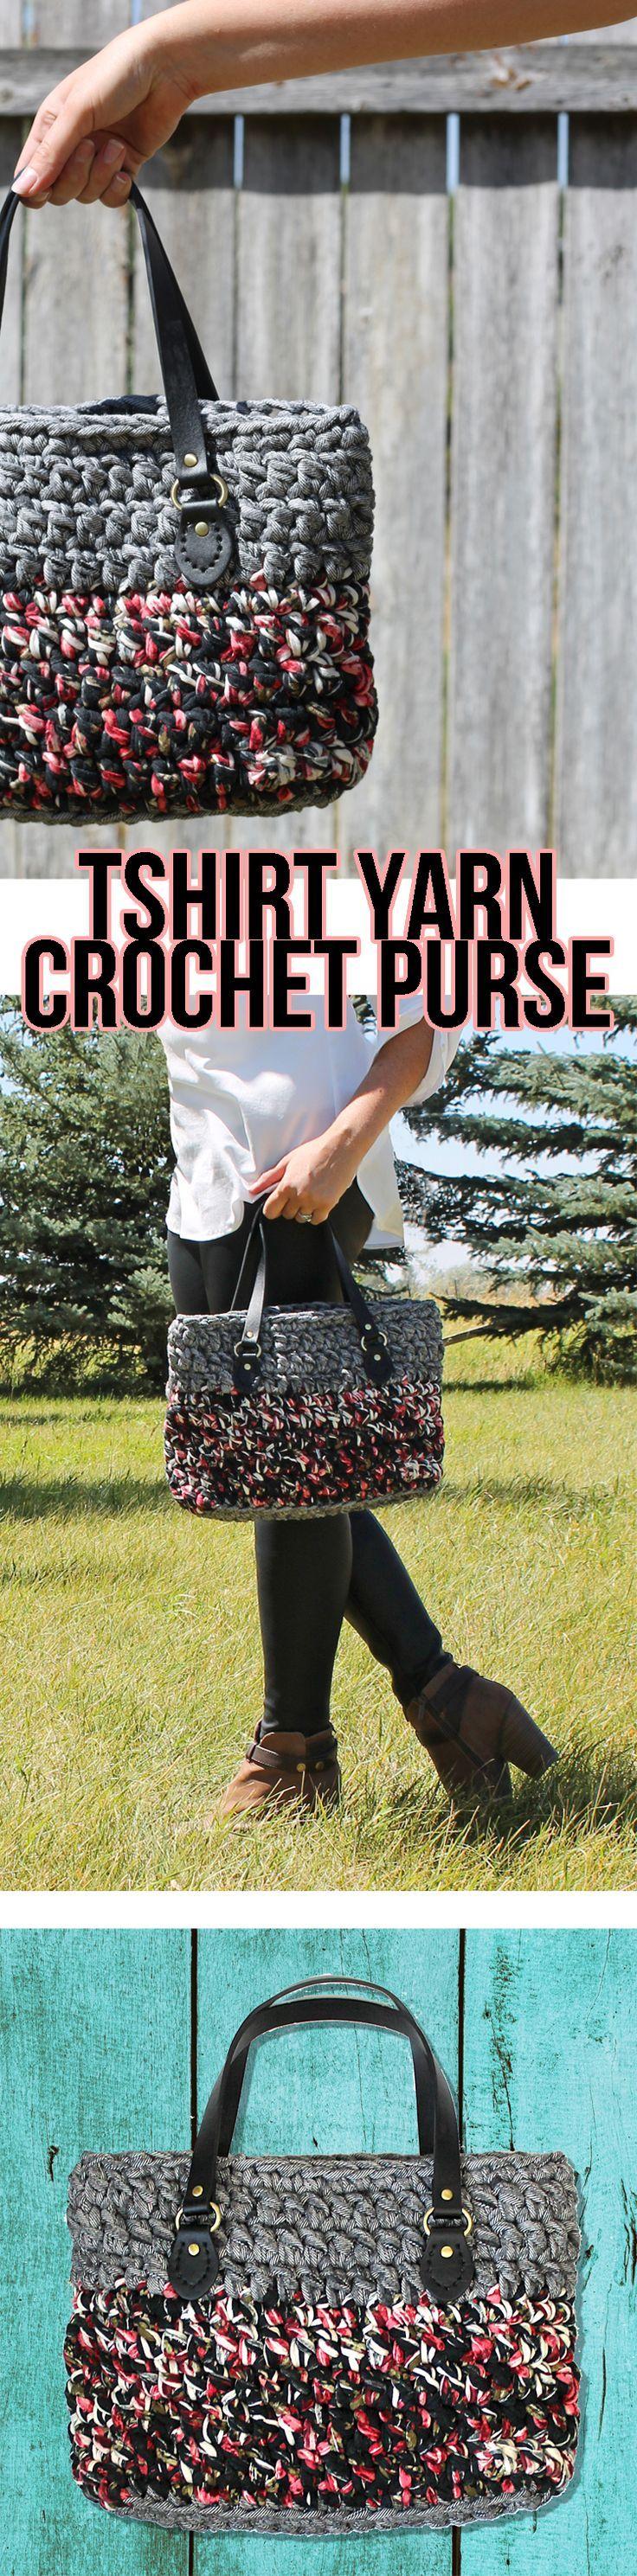 T-Shirt Yarn Crochet Bag (Free Pattern) | Pinterest | Free crochet ...